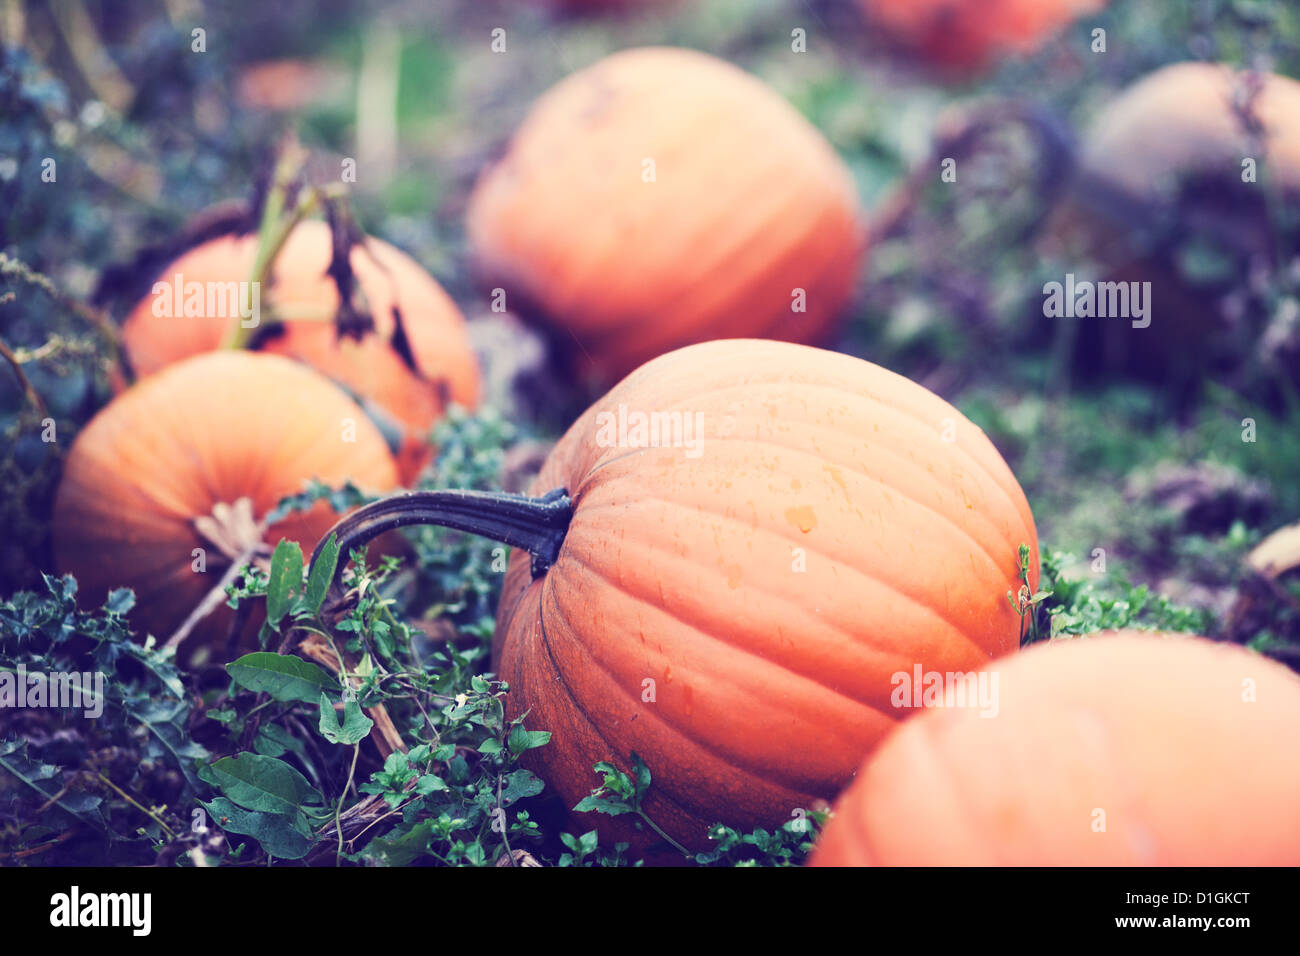 Close up of orange pumpkins in a pumpkin field. - Stock Image